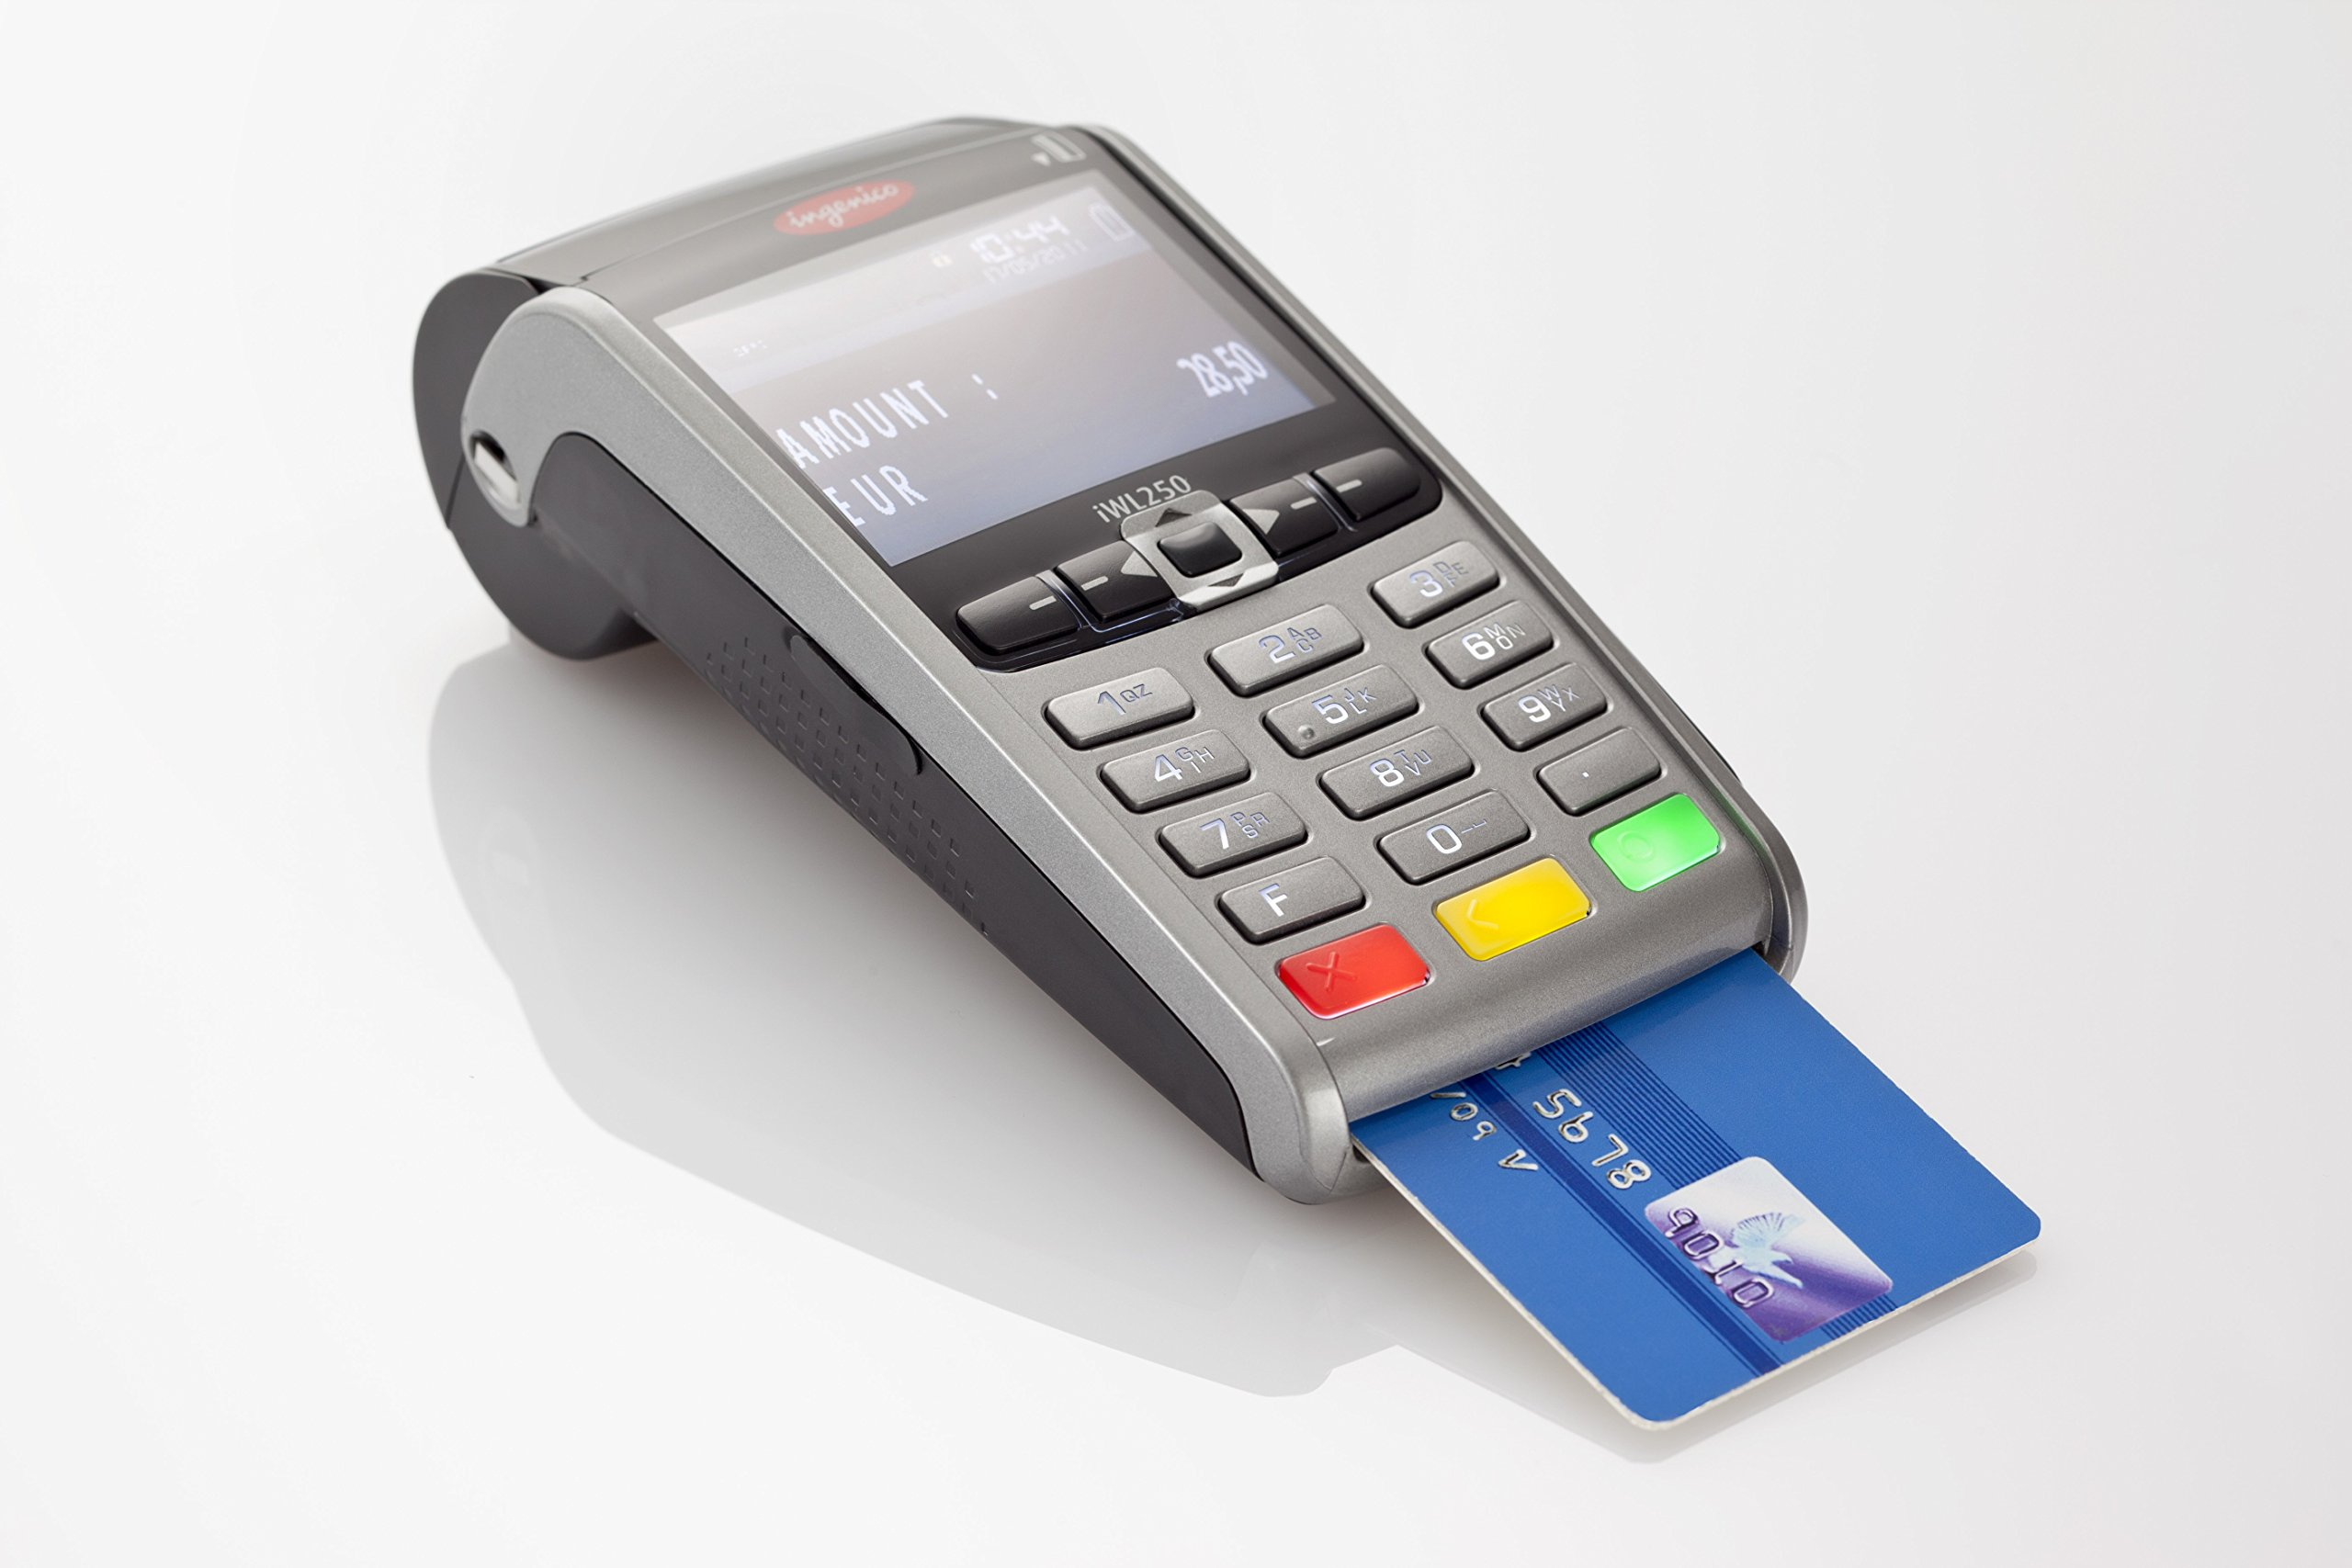 Ingenico iWL10 Wireless GPRS Credit Card Machine- Buy Online in